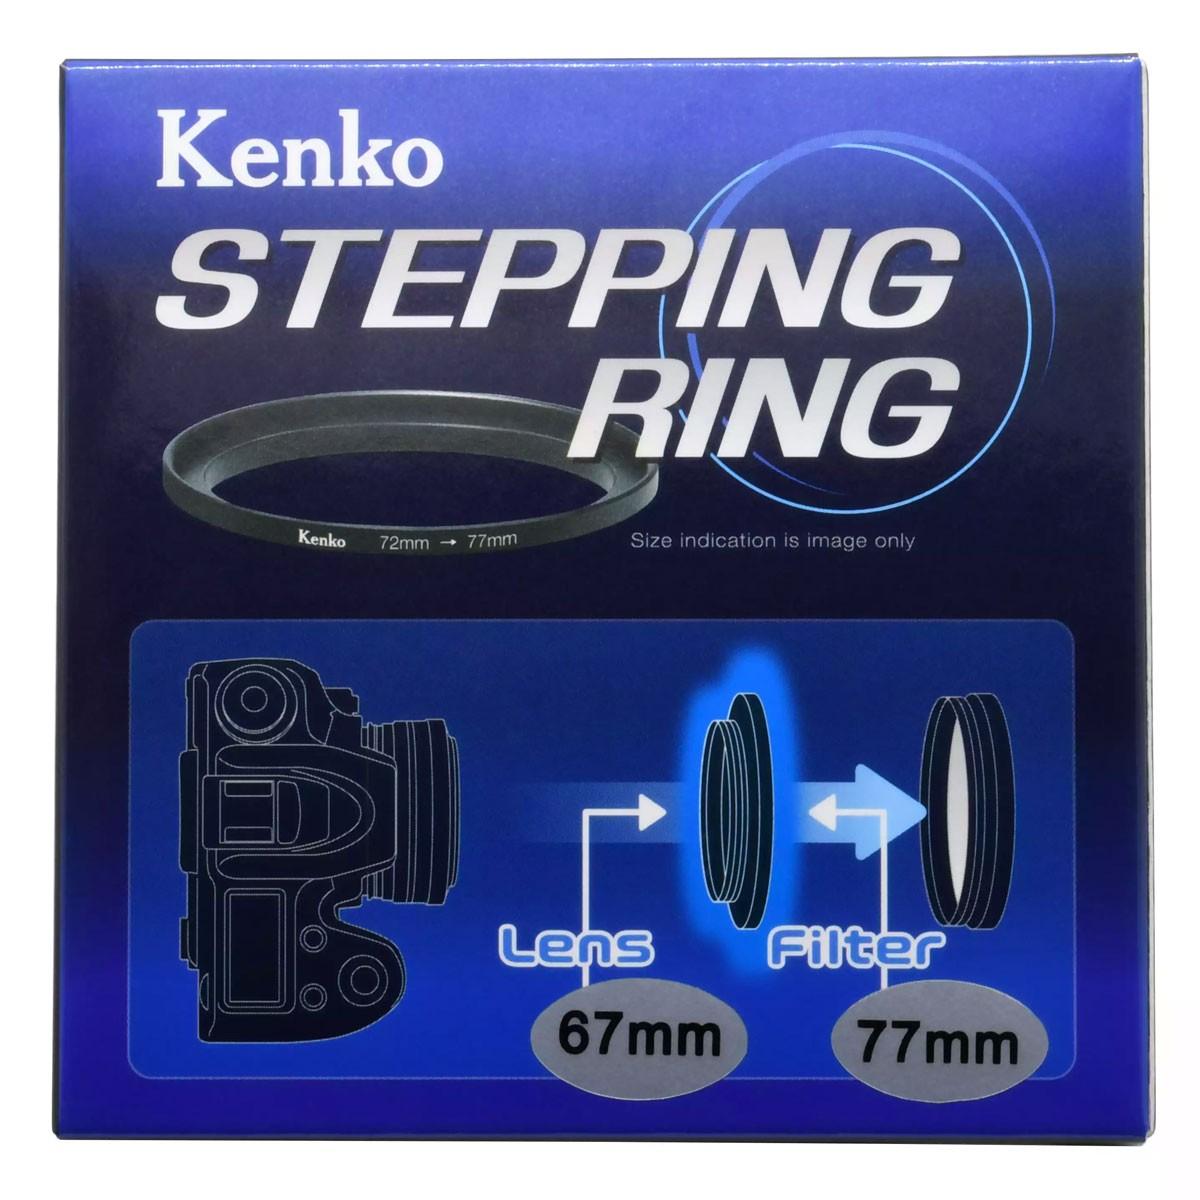 Kenko 52mm Y2 Professional Multi-Coated Camera Lens Filters